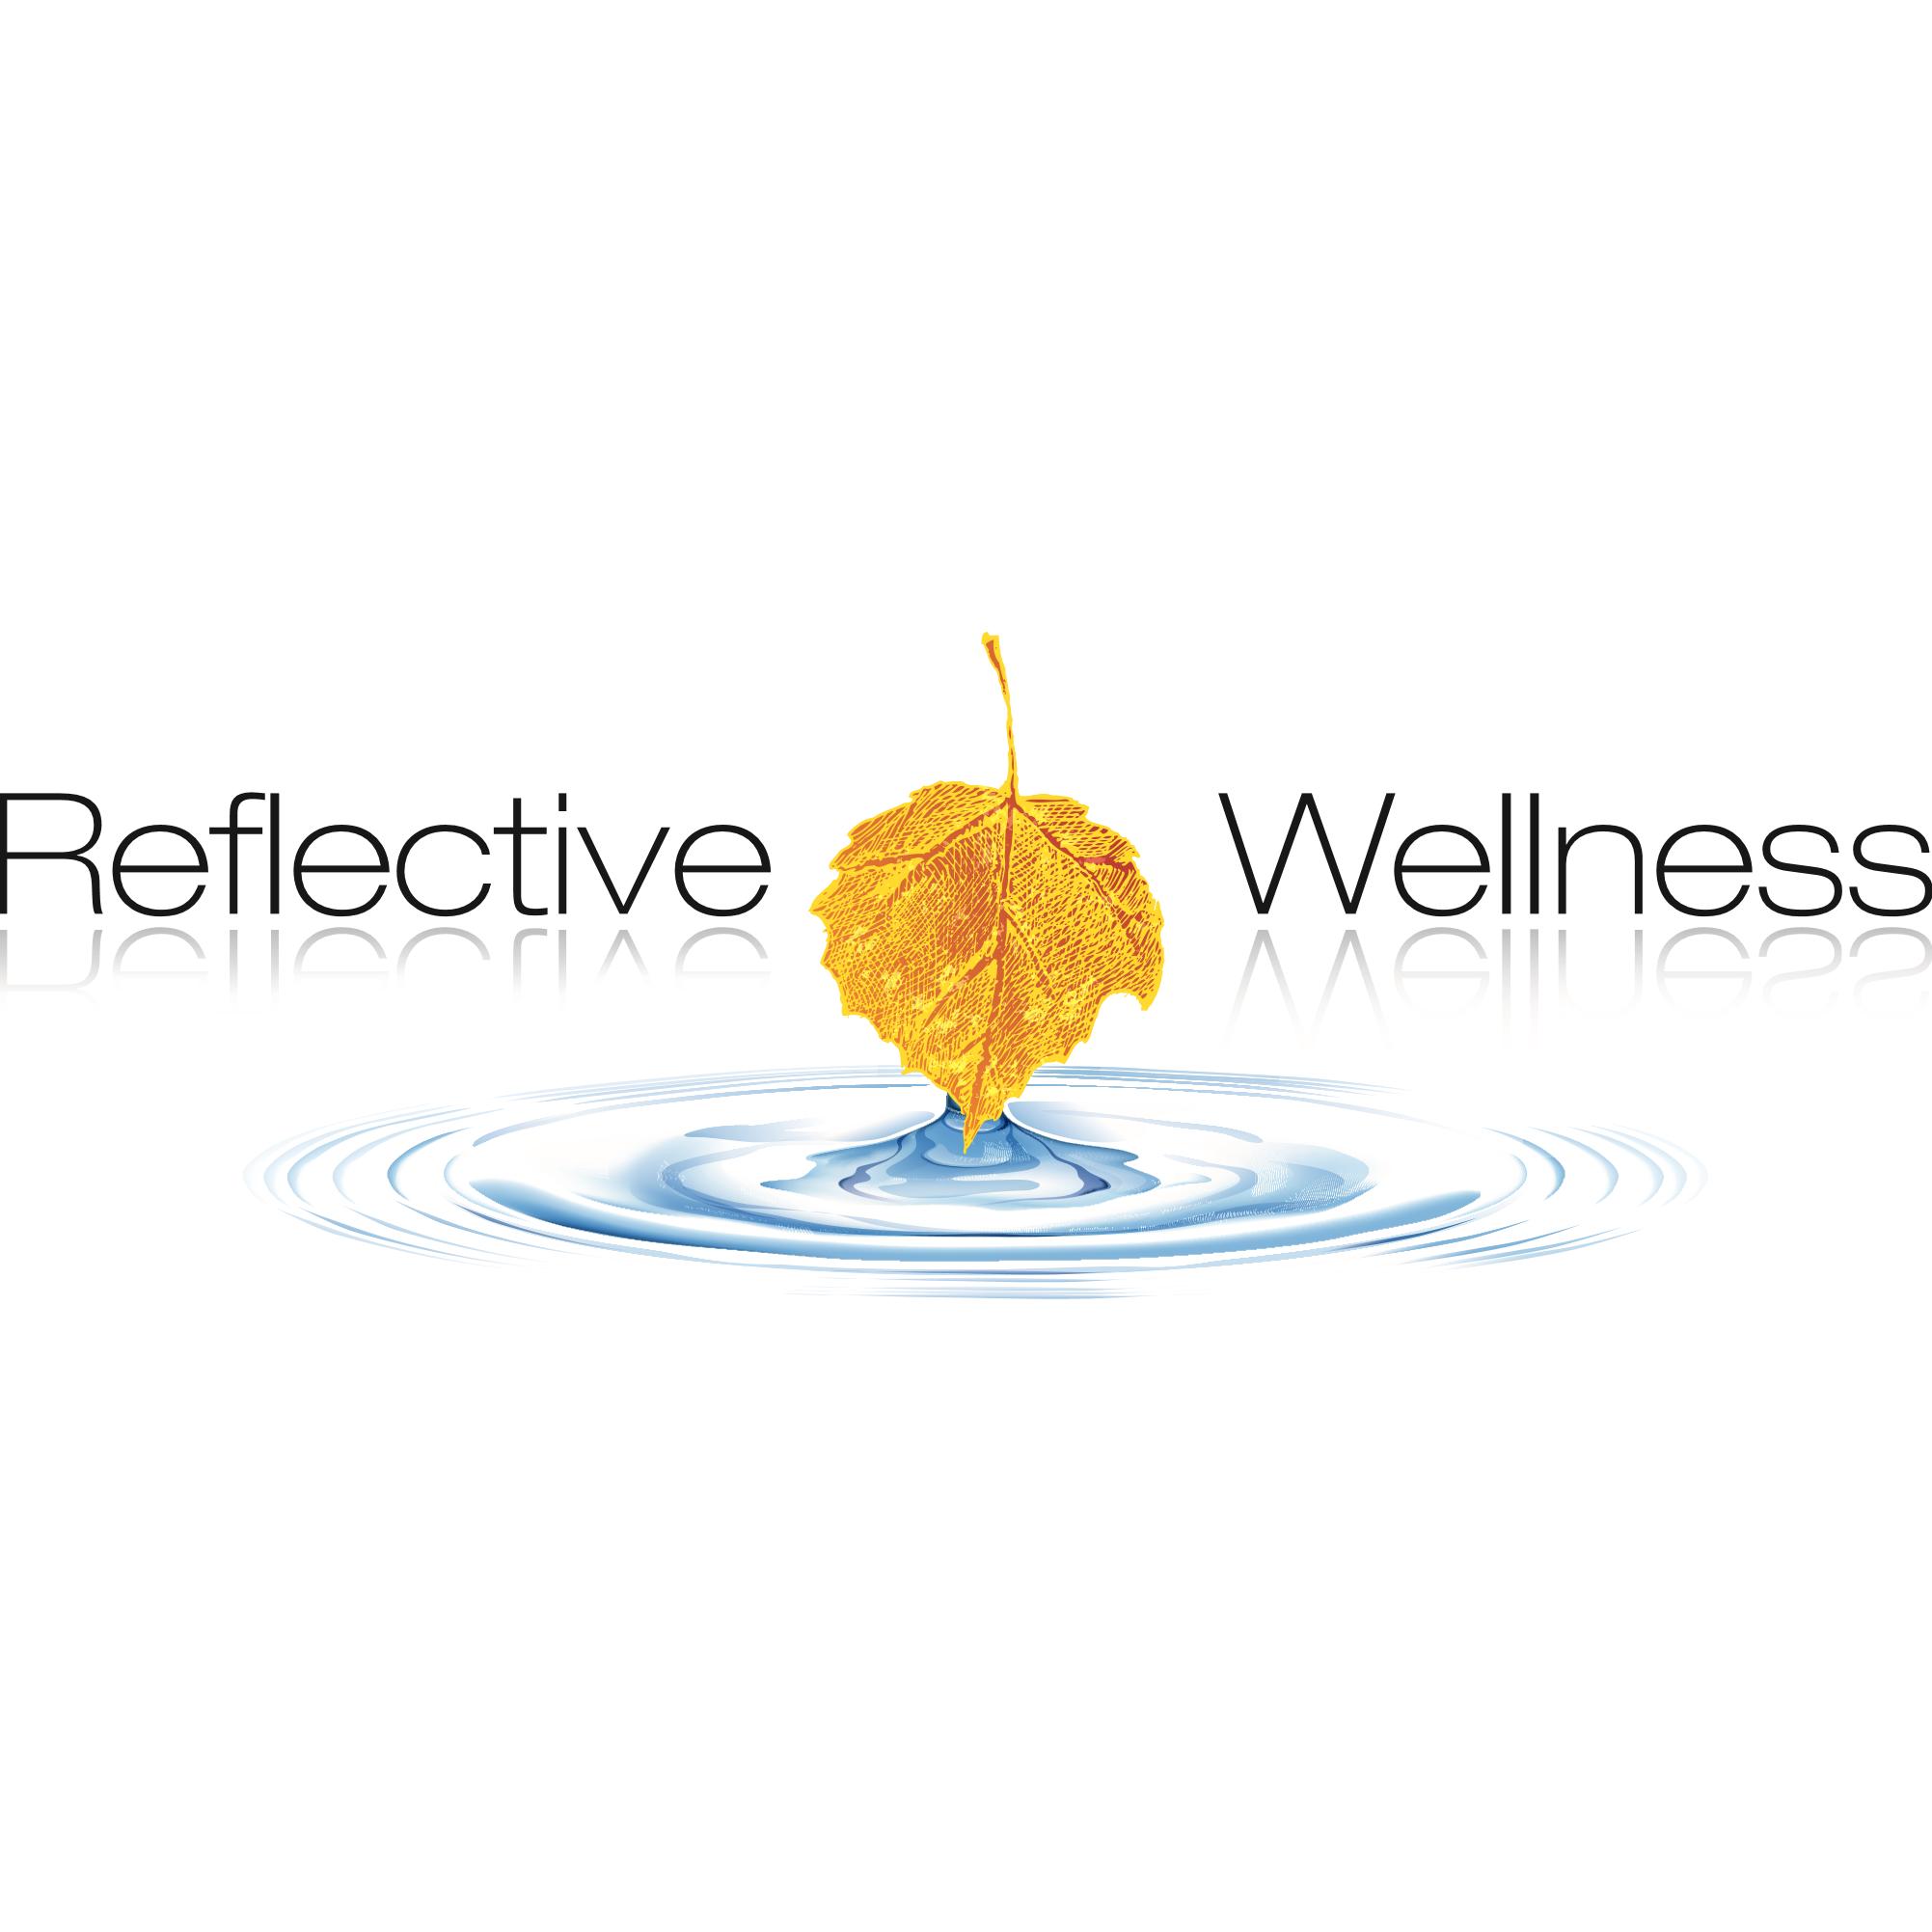 Reflective Wellness